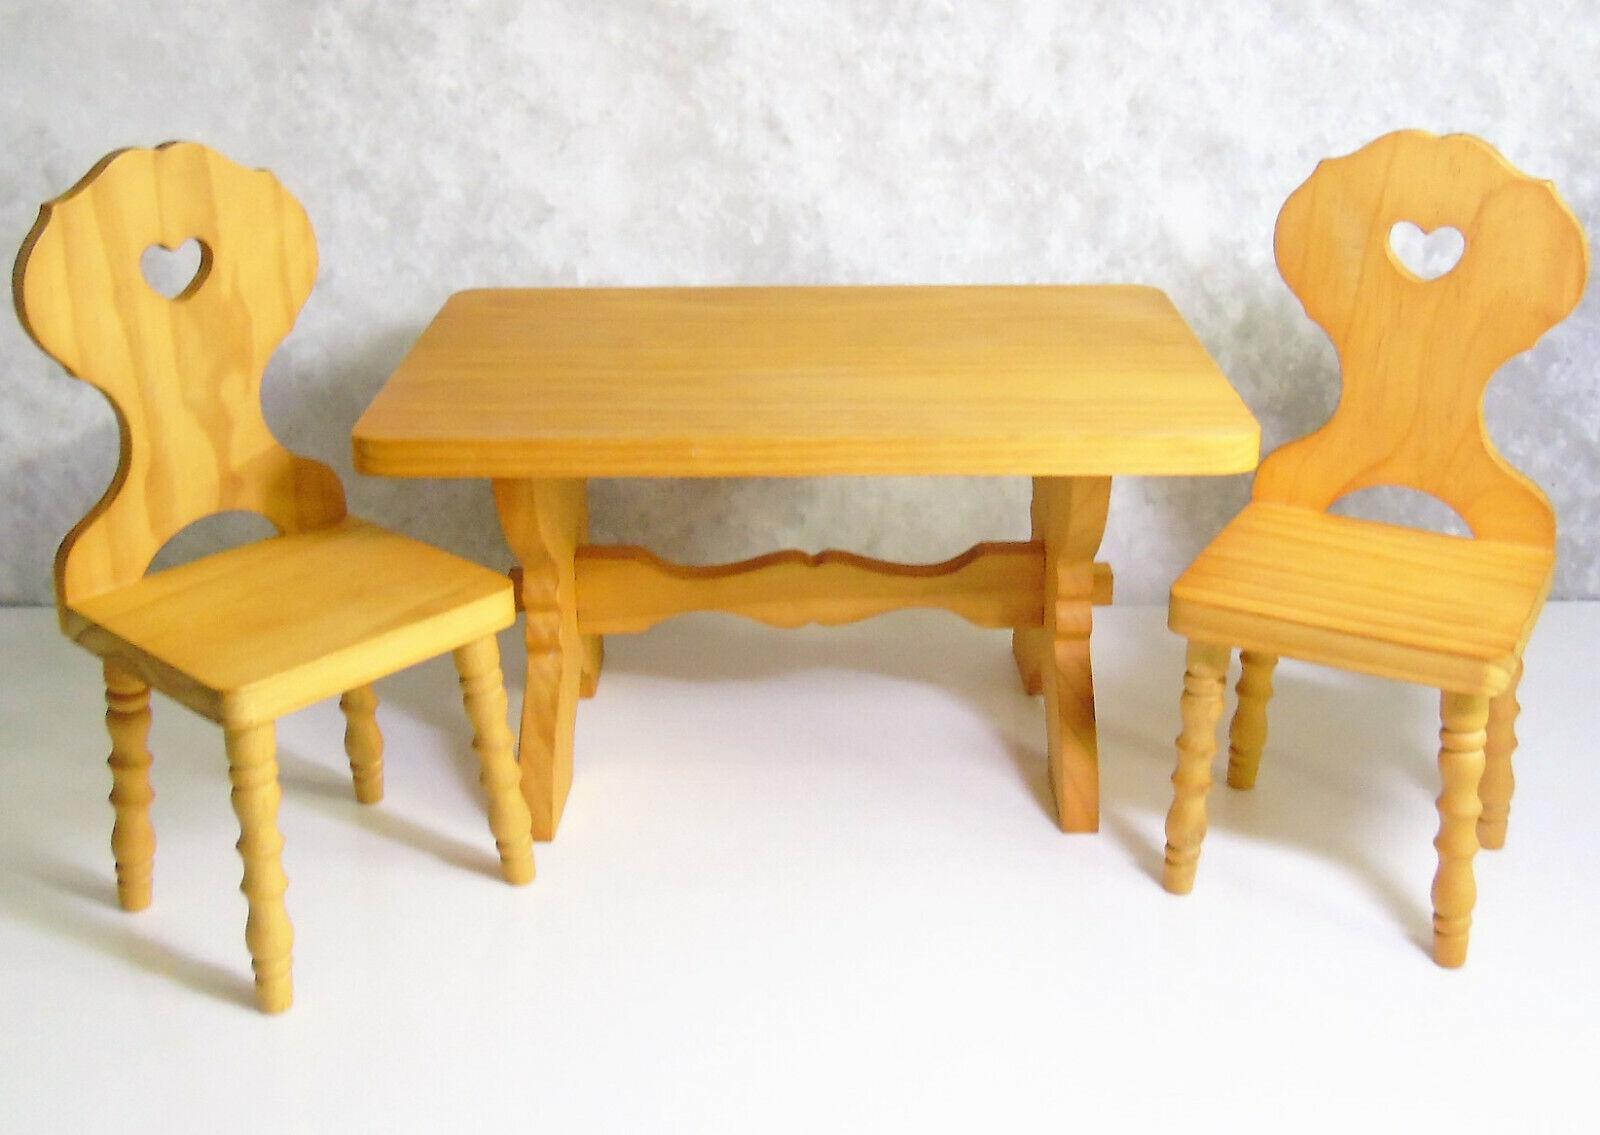 American Girl Doll Möbel KIRSTEN'S Holz Arbeitsbock Tisch & Stühle Echtholz